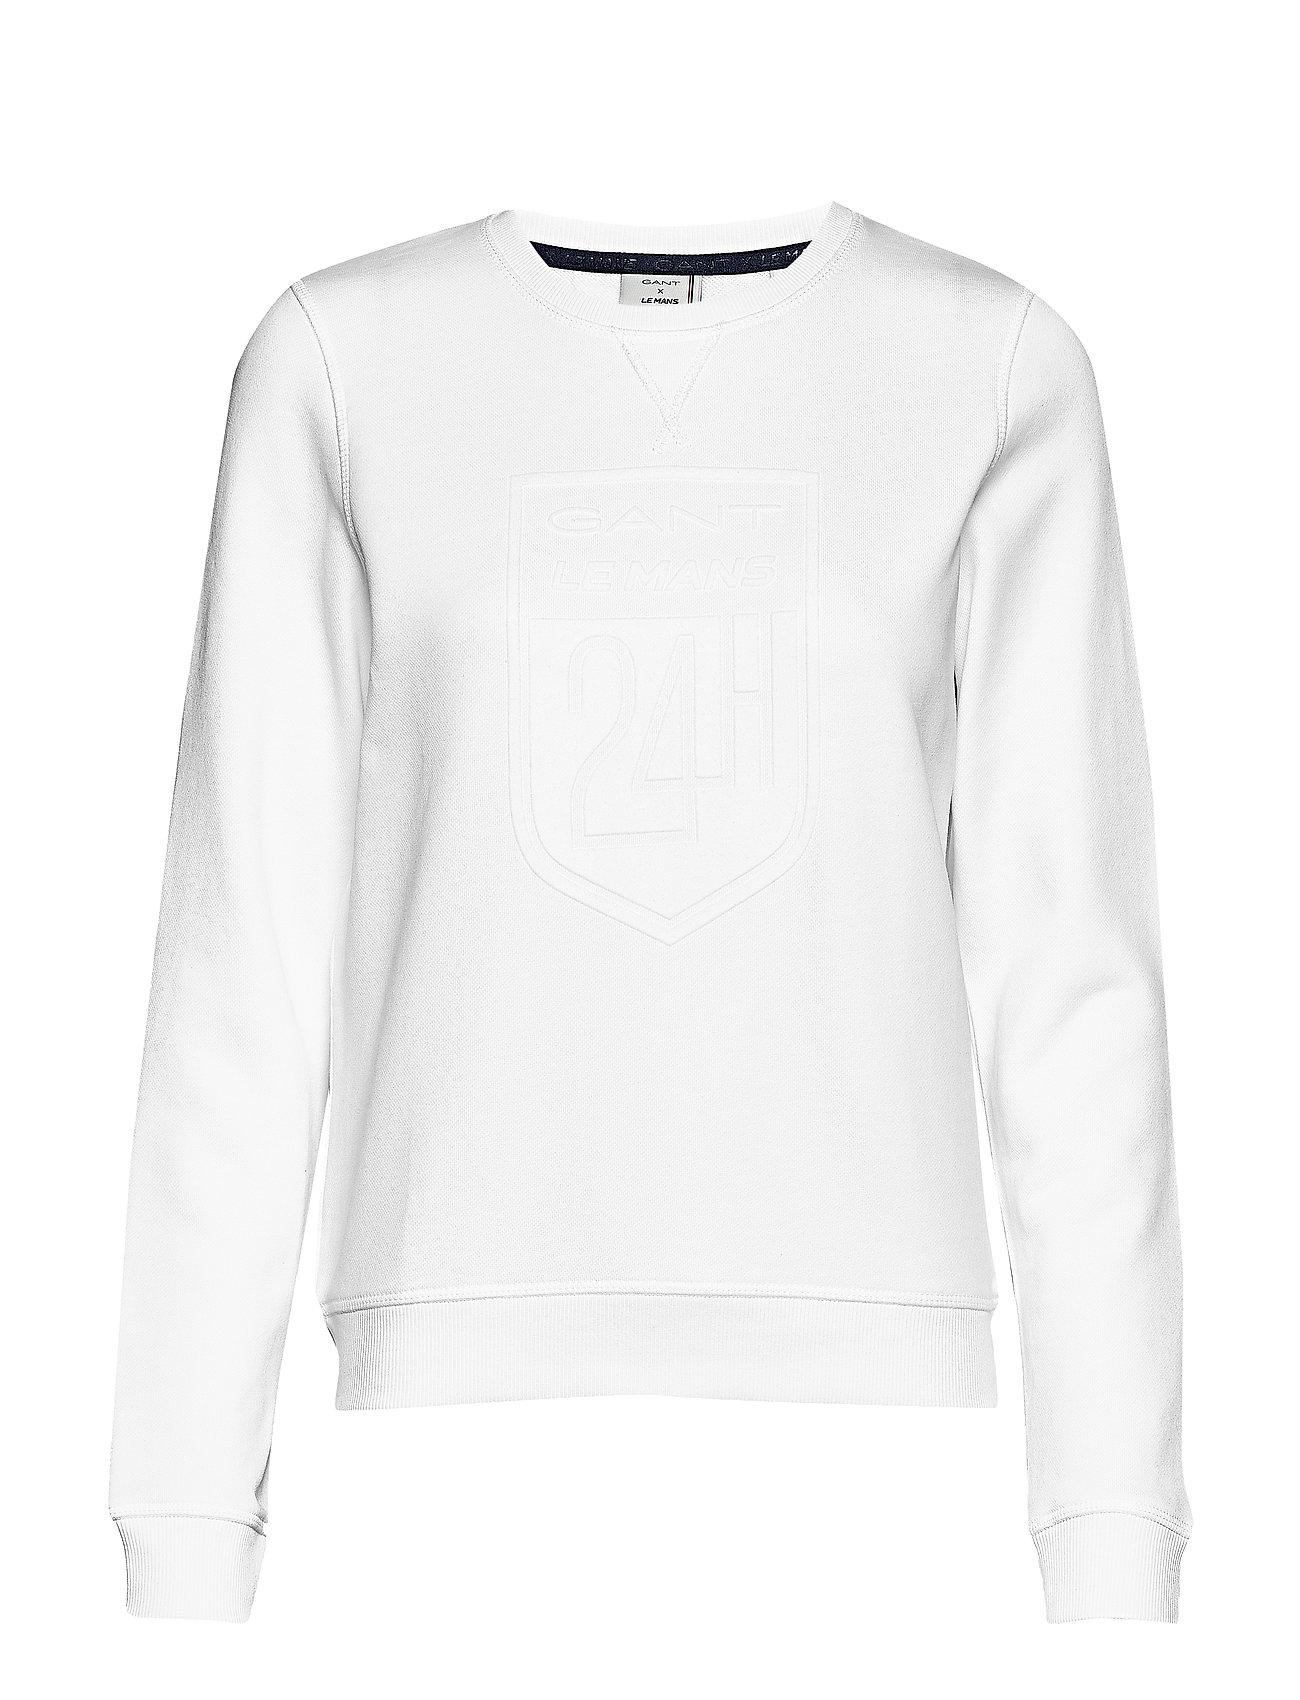 GANT LM. LM C-NECK SWEAT - WHITE